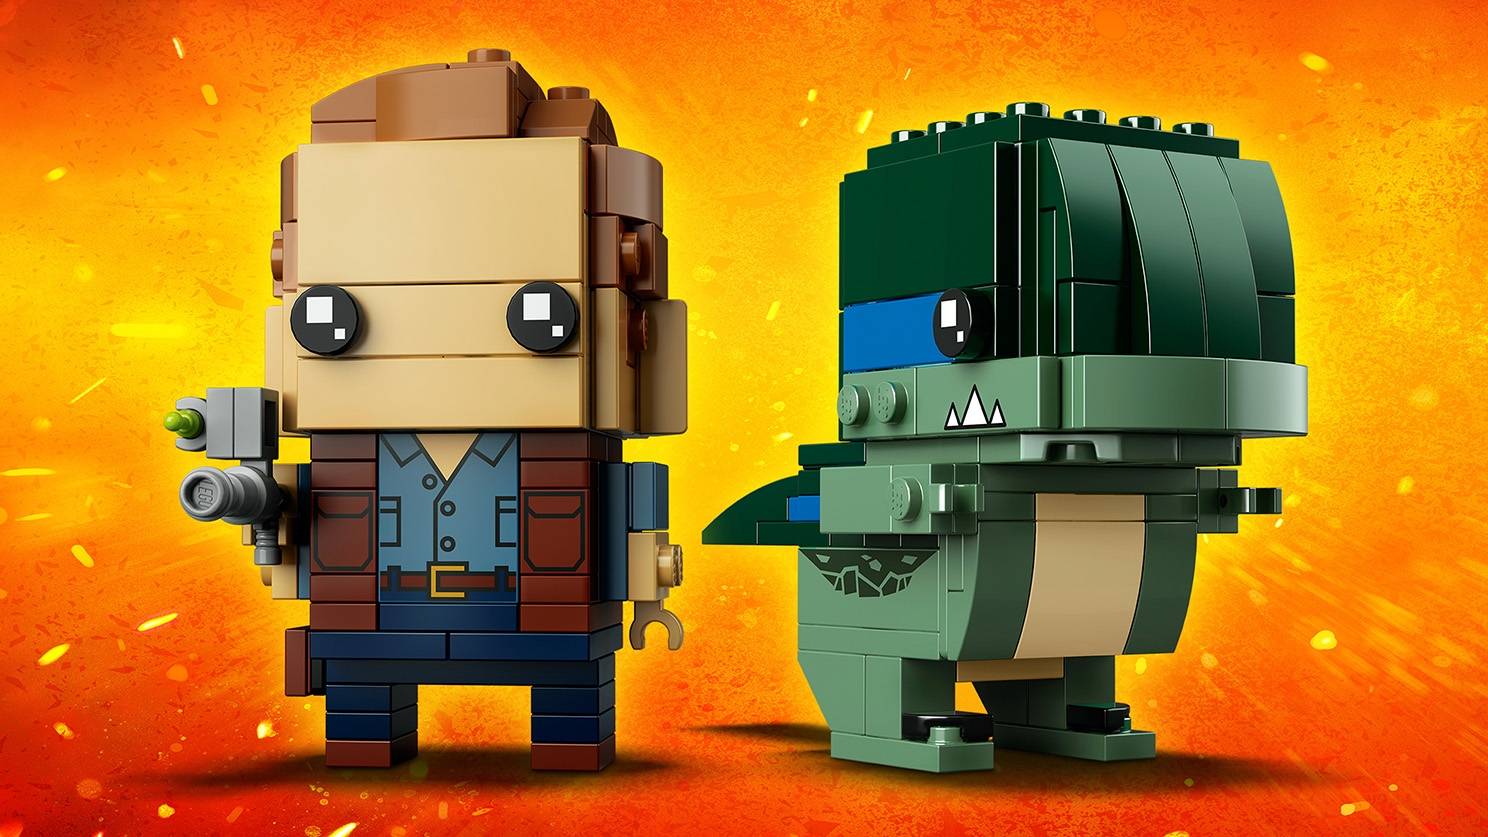 LEGO Brickheadz - 41614 Owen and Blue - Build LEGO Brickheadz figures of Owen from Jurassic World and his green dinosaur Blue.